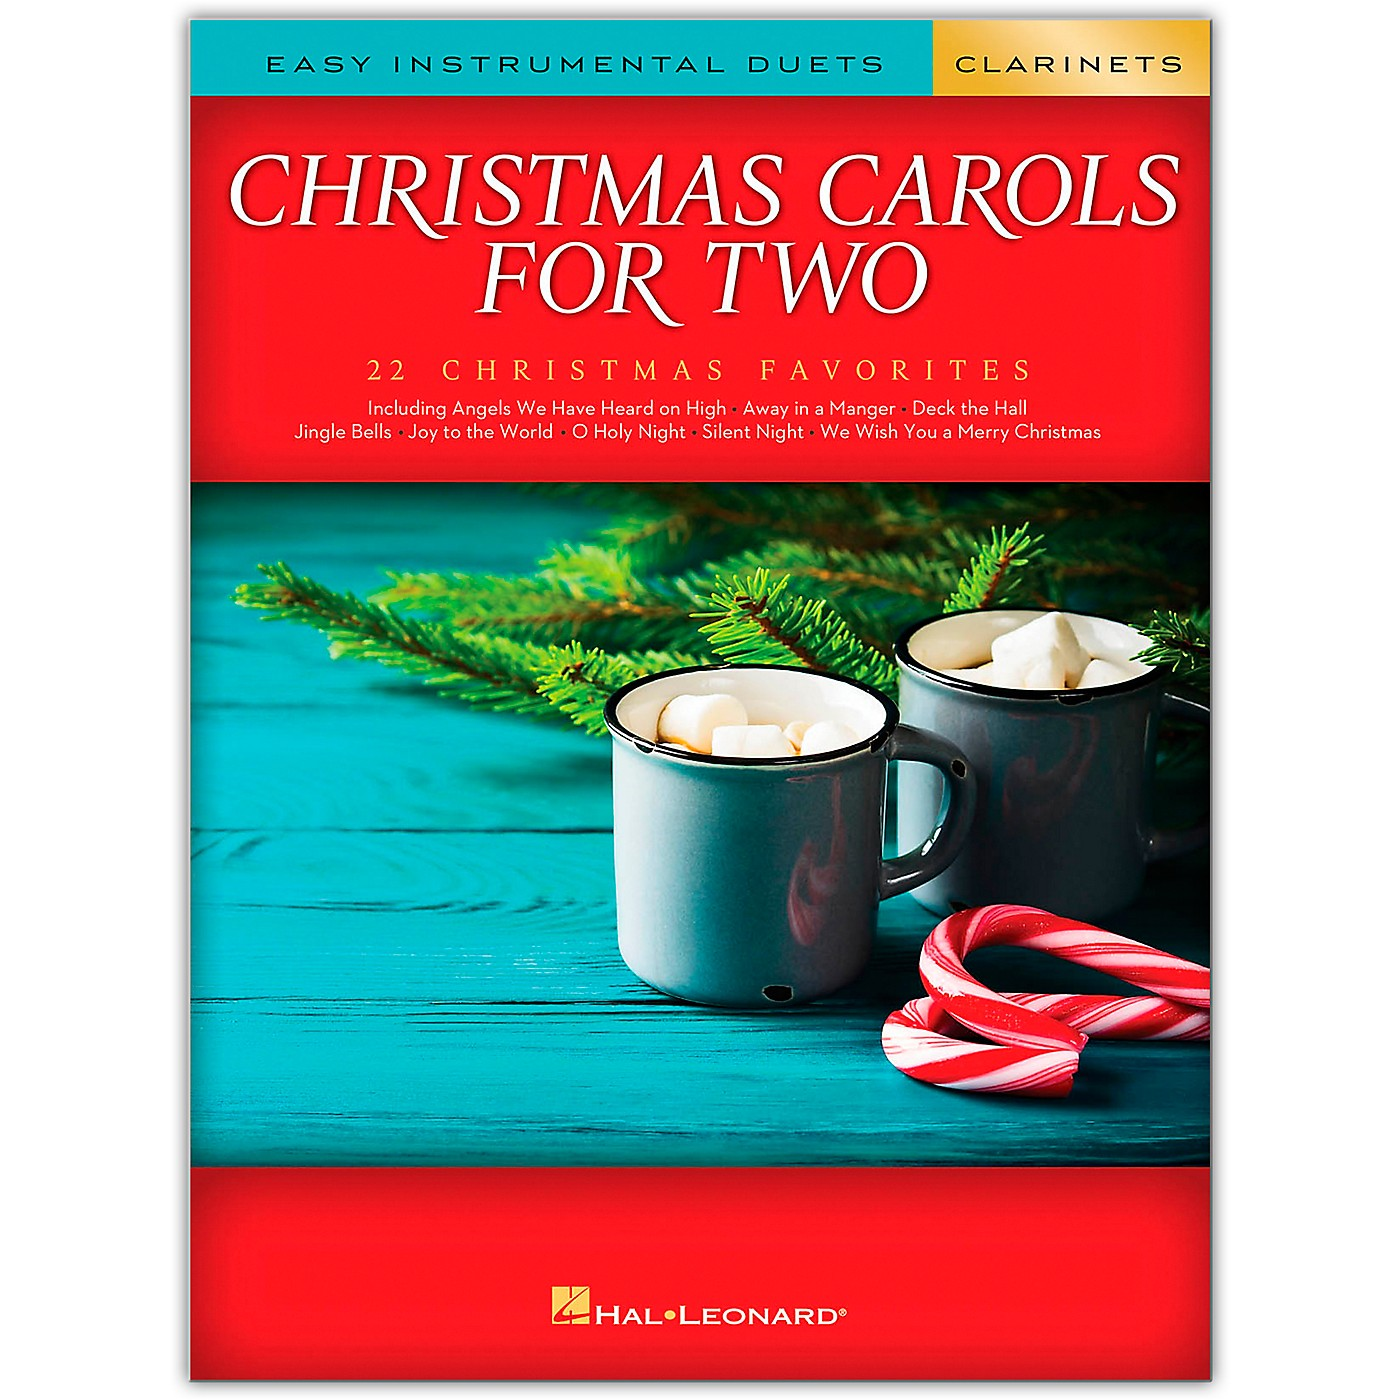 Hal Leonard Christmas Carols for Two Clarinets (Easy Instrumental Duets) Songbook thumbnail